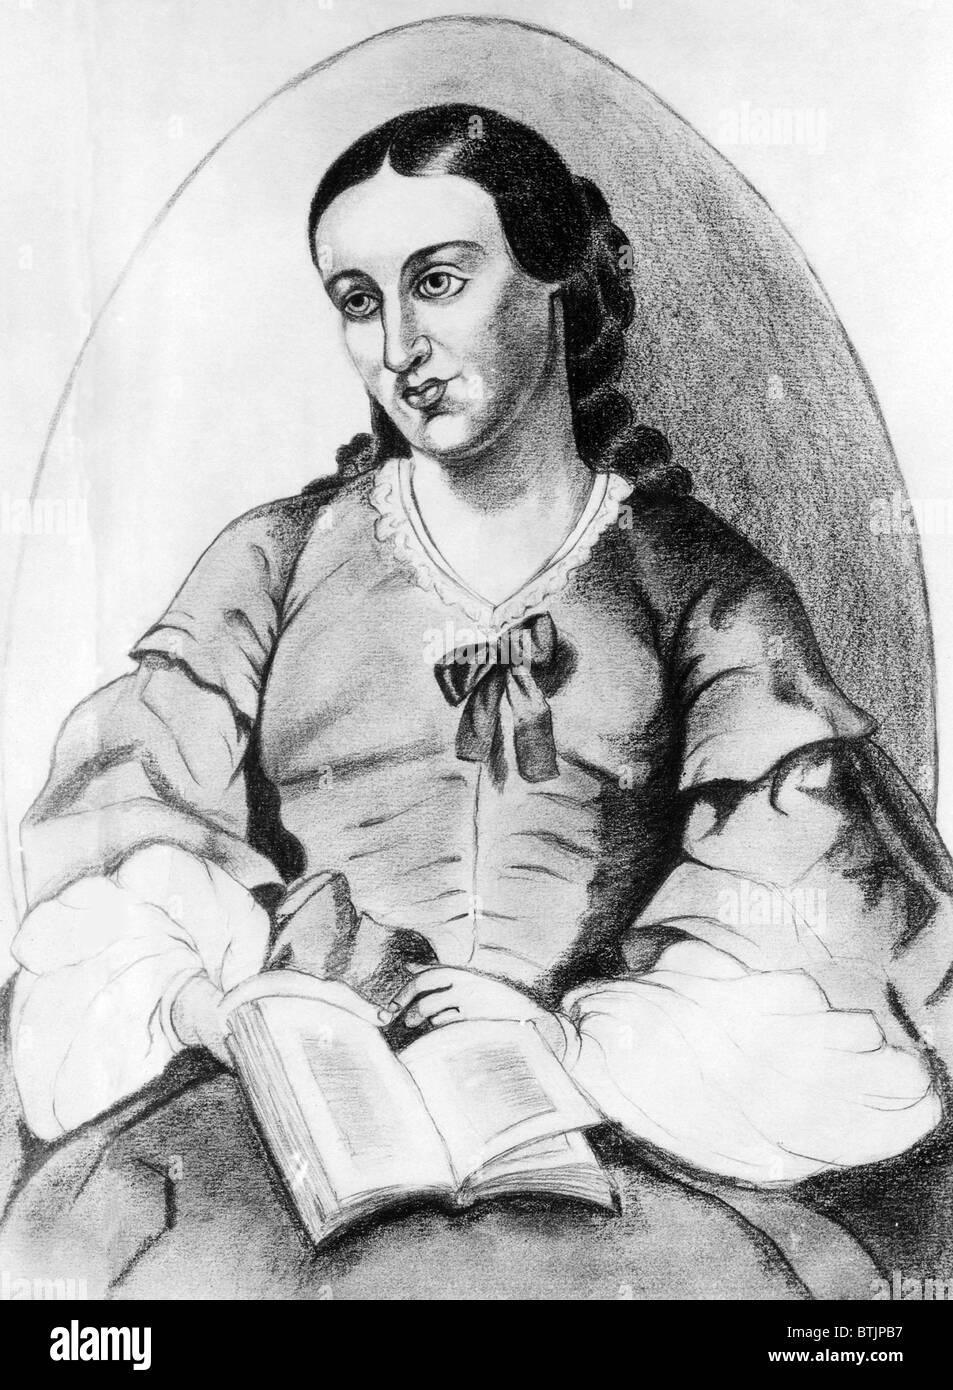 pioneer woman clothing drawing. a pencil drawing of america\u0027s pioneer feminist margaret fuller by s.w. bergman. ca. mid 1800s. woman clothing